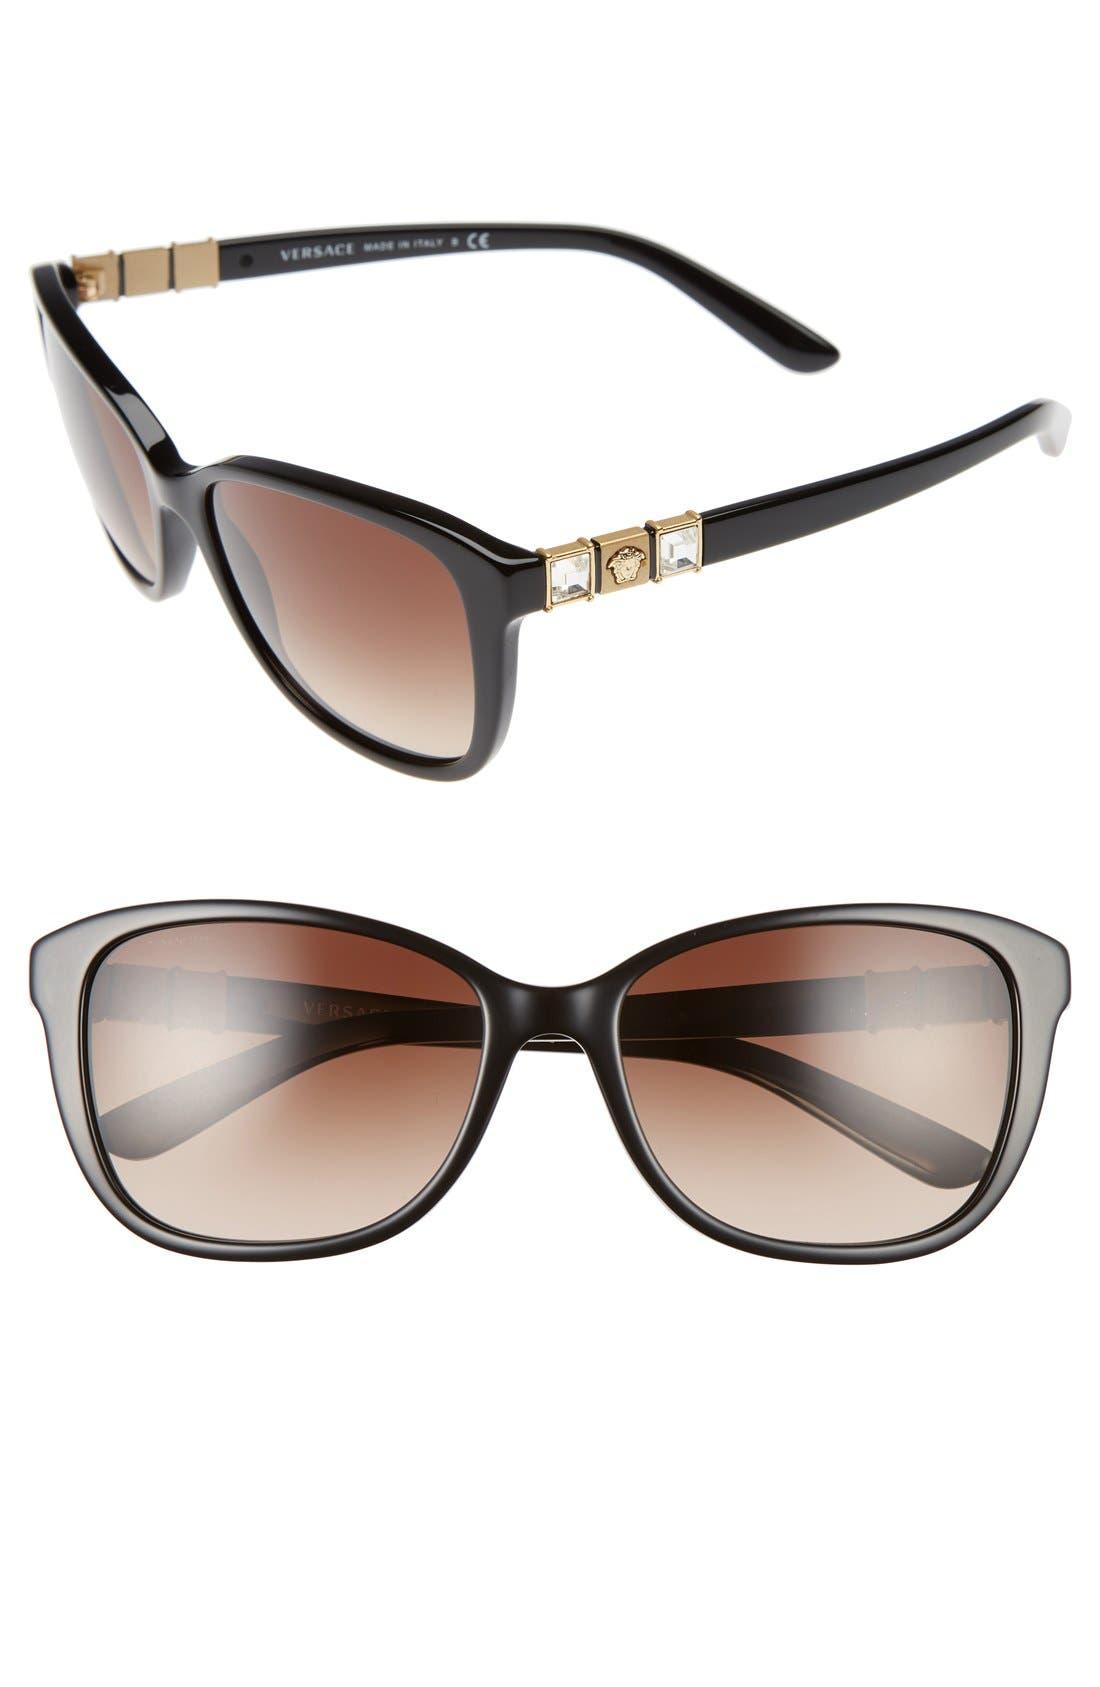 Main Image - Versace 57mm Sunglasses